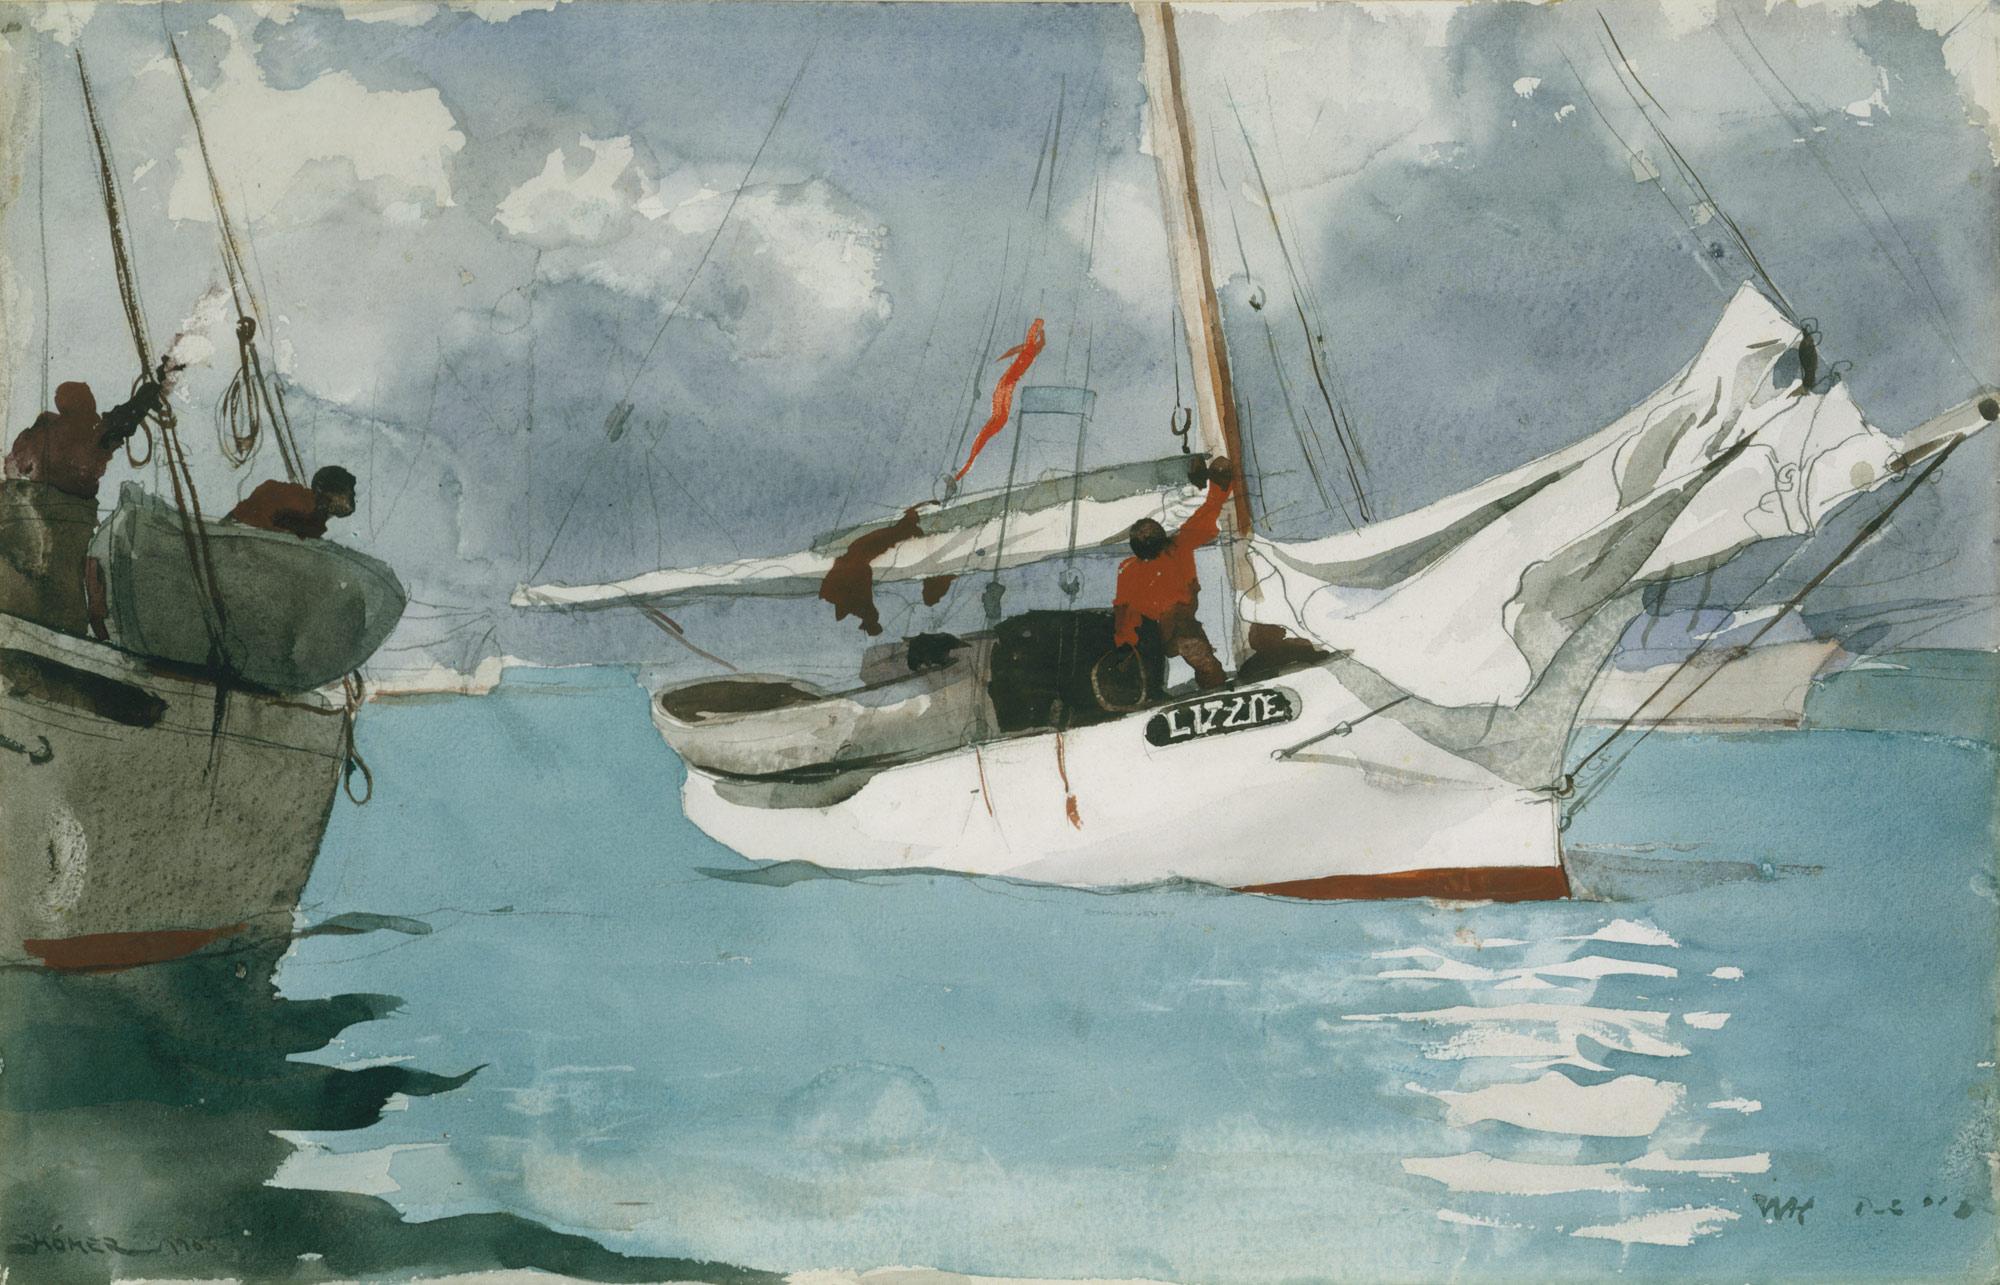 Fishing Boats, Key West | Winslow Homer | 10.228.1 | Work of Art ...